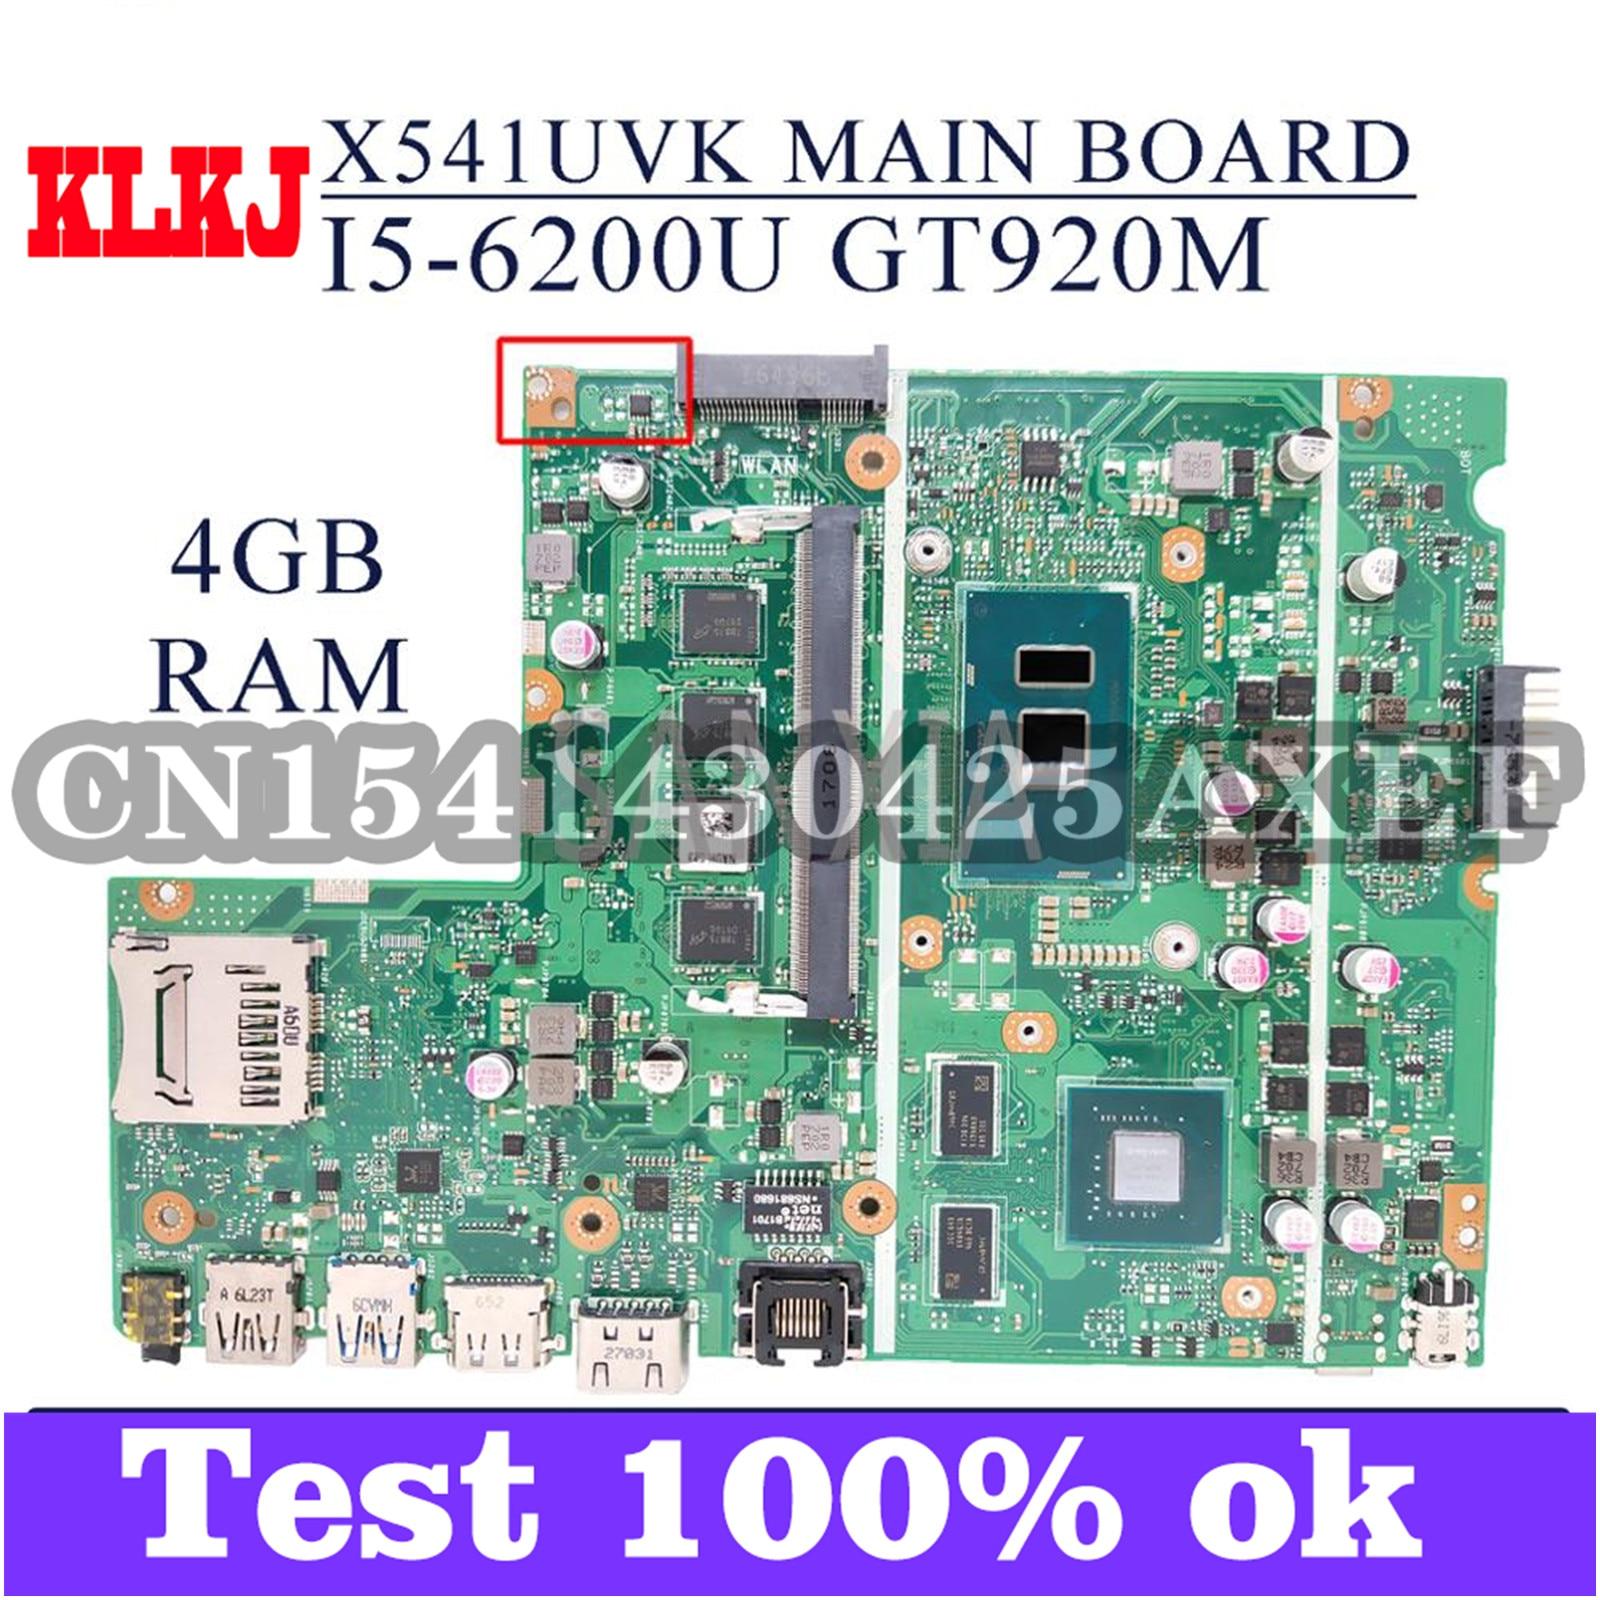 KLKJ X541UVK اللوحة الأم لأجهزة الكمبيوتر المحمول ASUS X541UJ X541UV اللوحة الرئيسية الأصلية 4GB-RAM I5-6200U GT920M